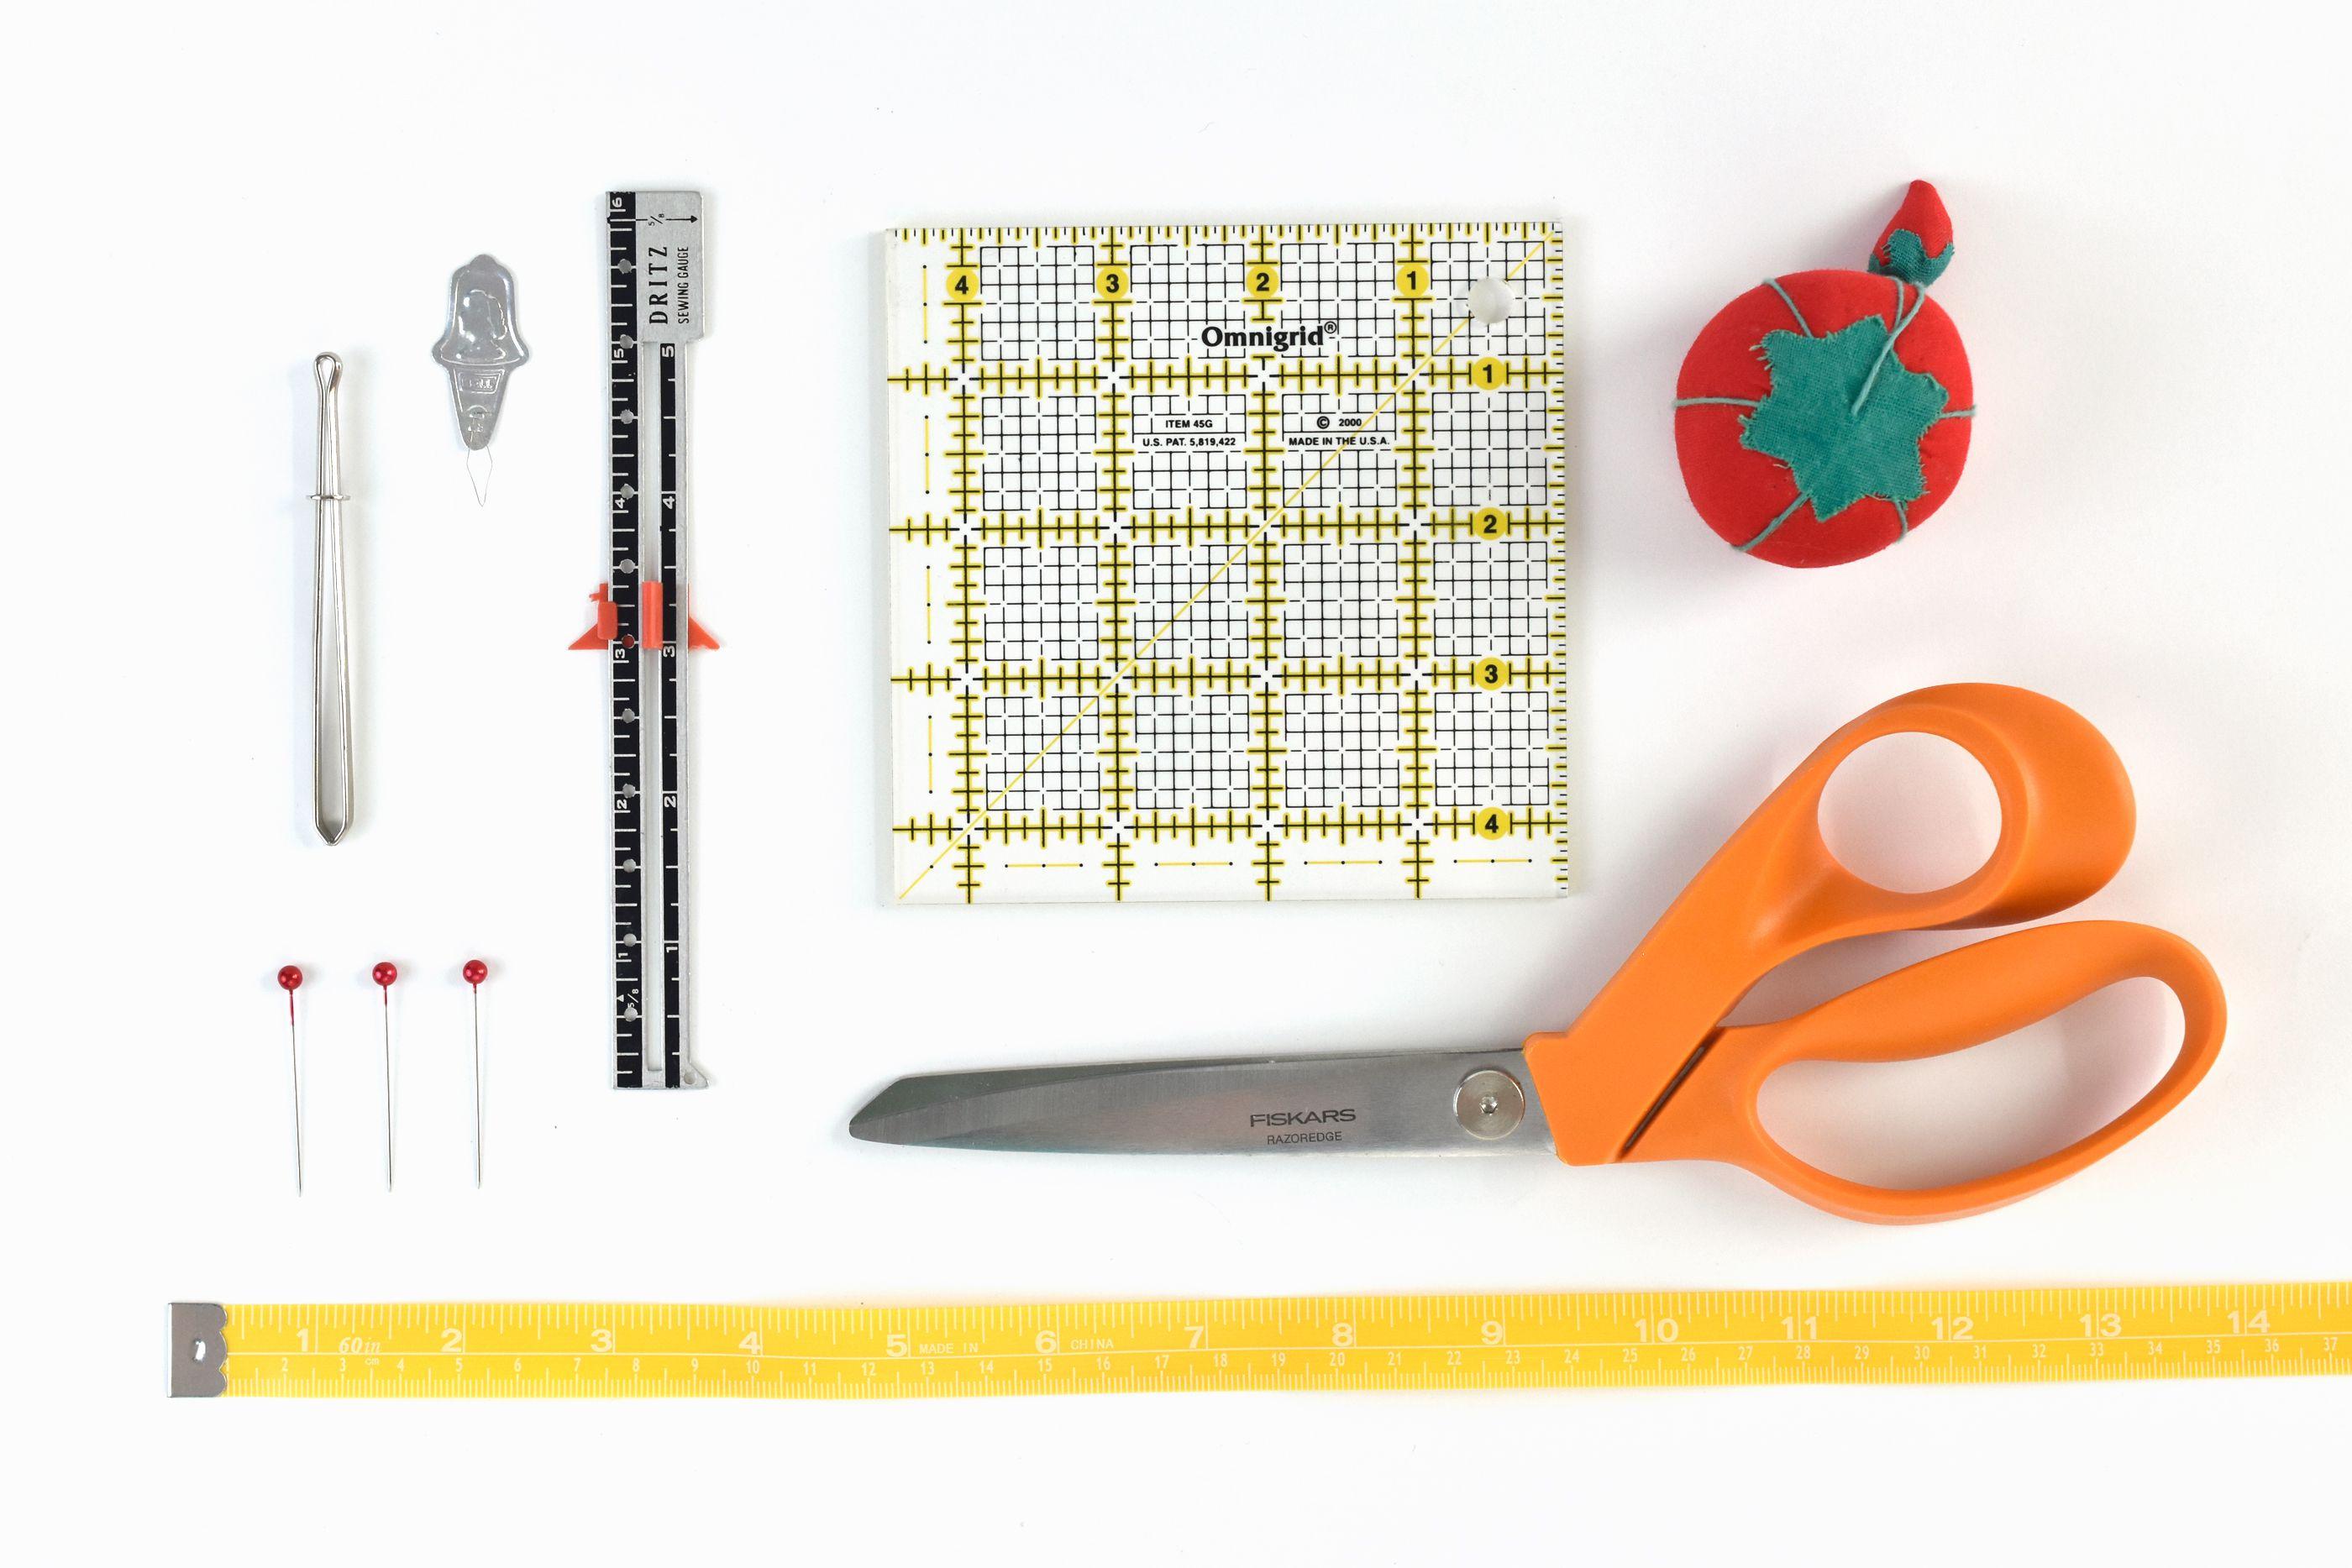 3 Styles 3 Pieces Sliding Gauge Sewing Measuring Tool Metal Sewing Gauge Fabric Quilting Ruler Seam Measuring Gauge for DIY Fabric Crafts Quilting Knitting Sewing Hemming Measuring Supplies